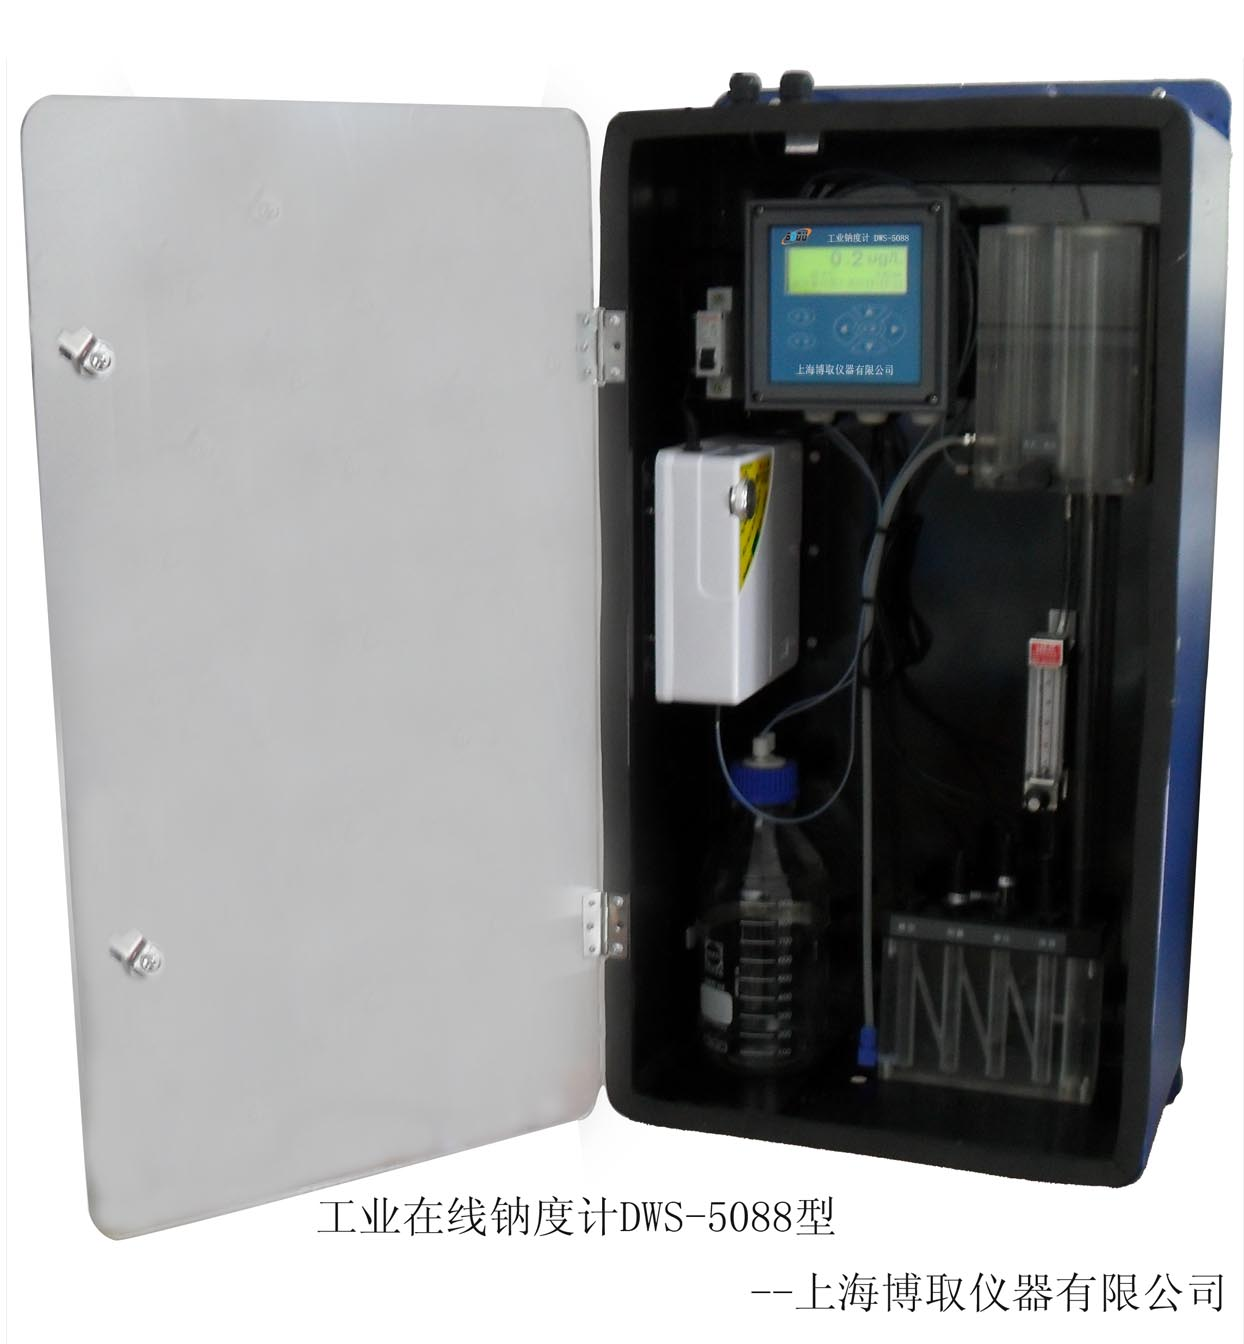 DWG-5088型工業鈉度計,在線鈉離子濃度計